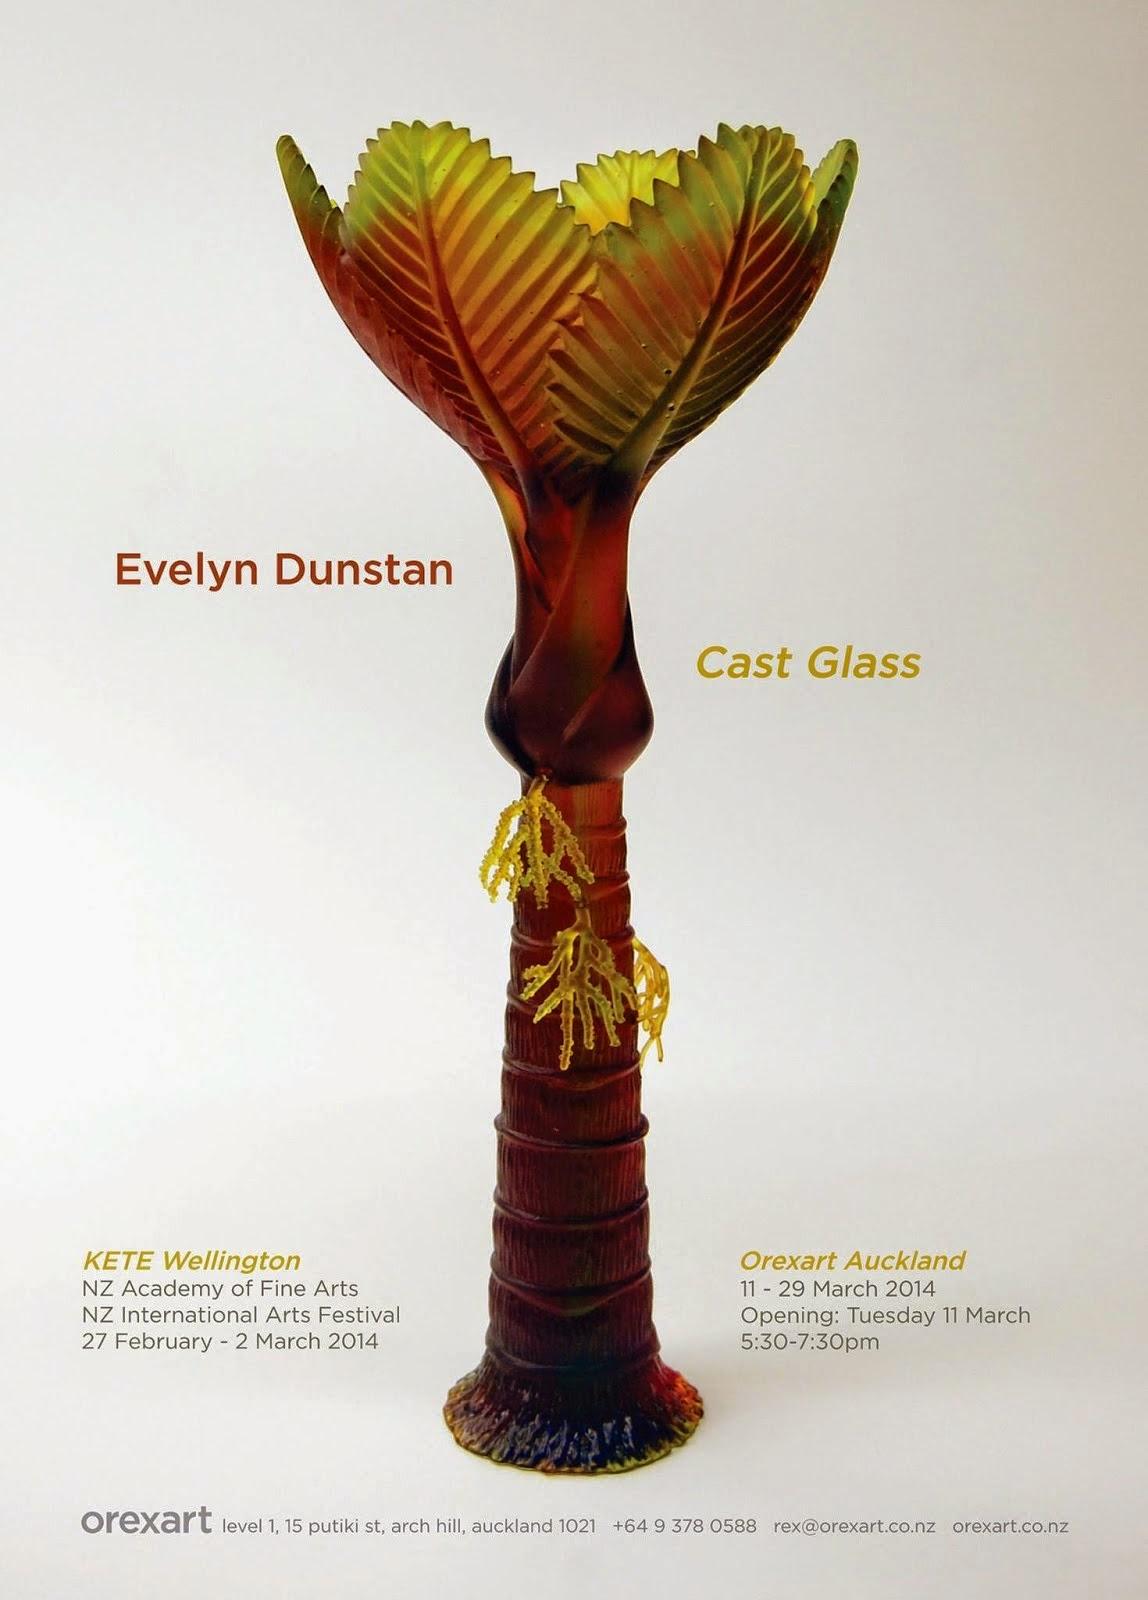 Evelyn Dunstan Cast Glass